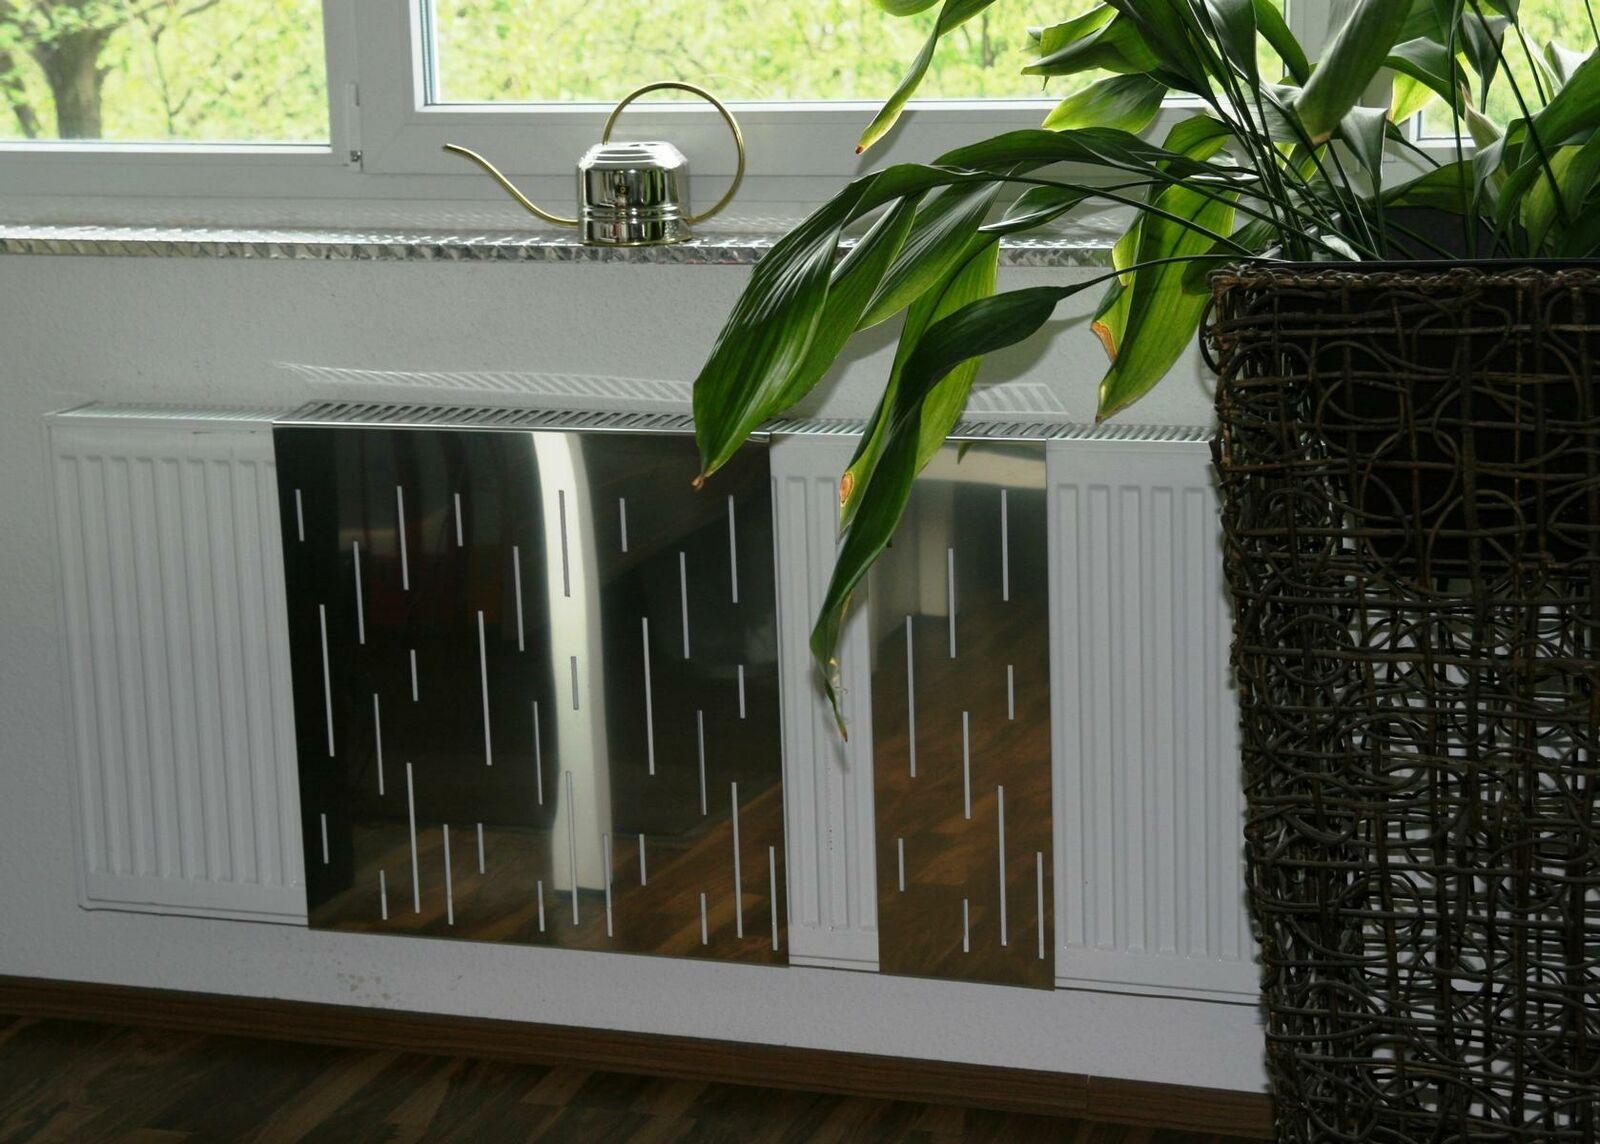 Heizkörper-Verkleidung Edelstahl, 62 x 20 cm Design: Rain, glänzend